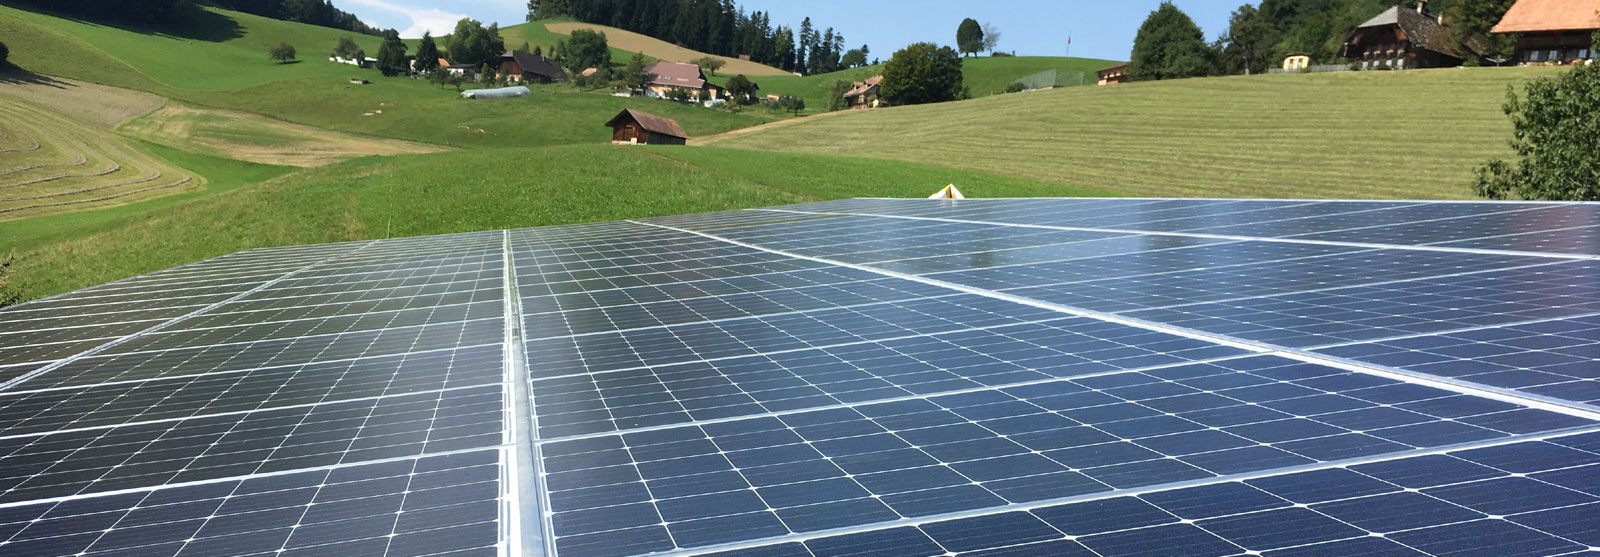 Solarstrom mit modernster Technik